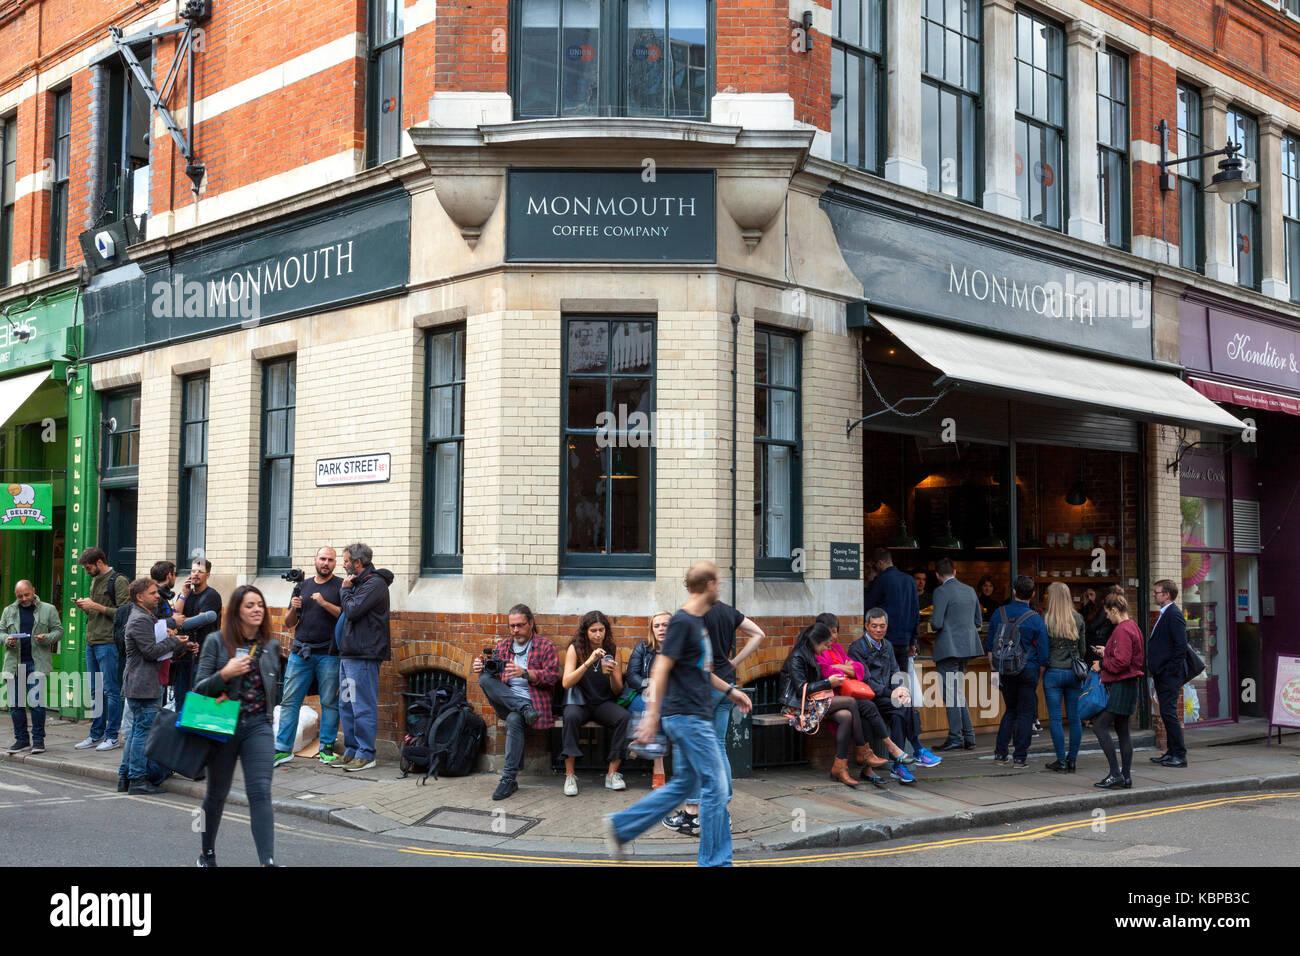 The Monmouth Coffee Company, Borough Market, London, England, U.K. - Stock Image